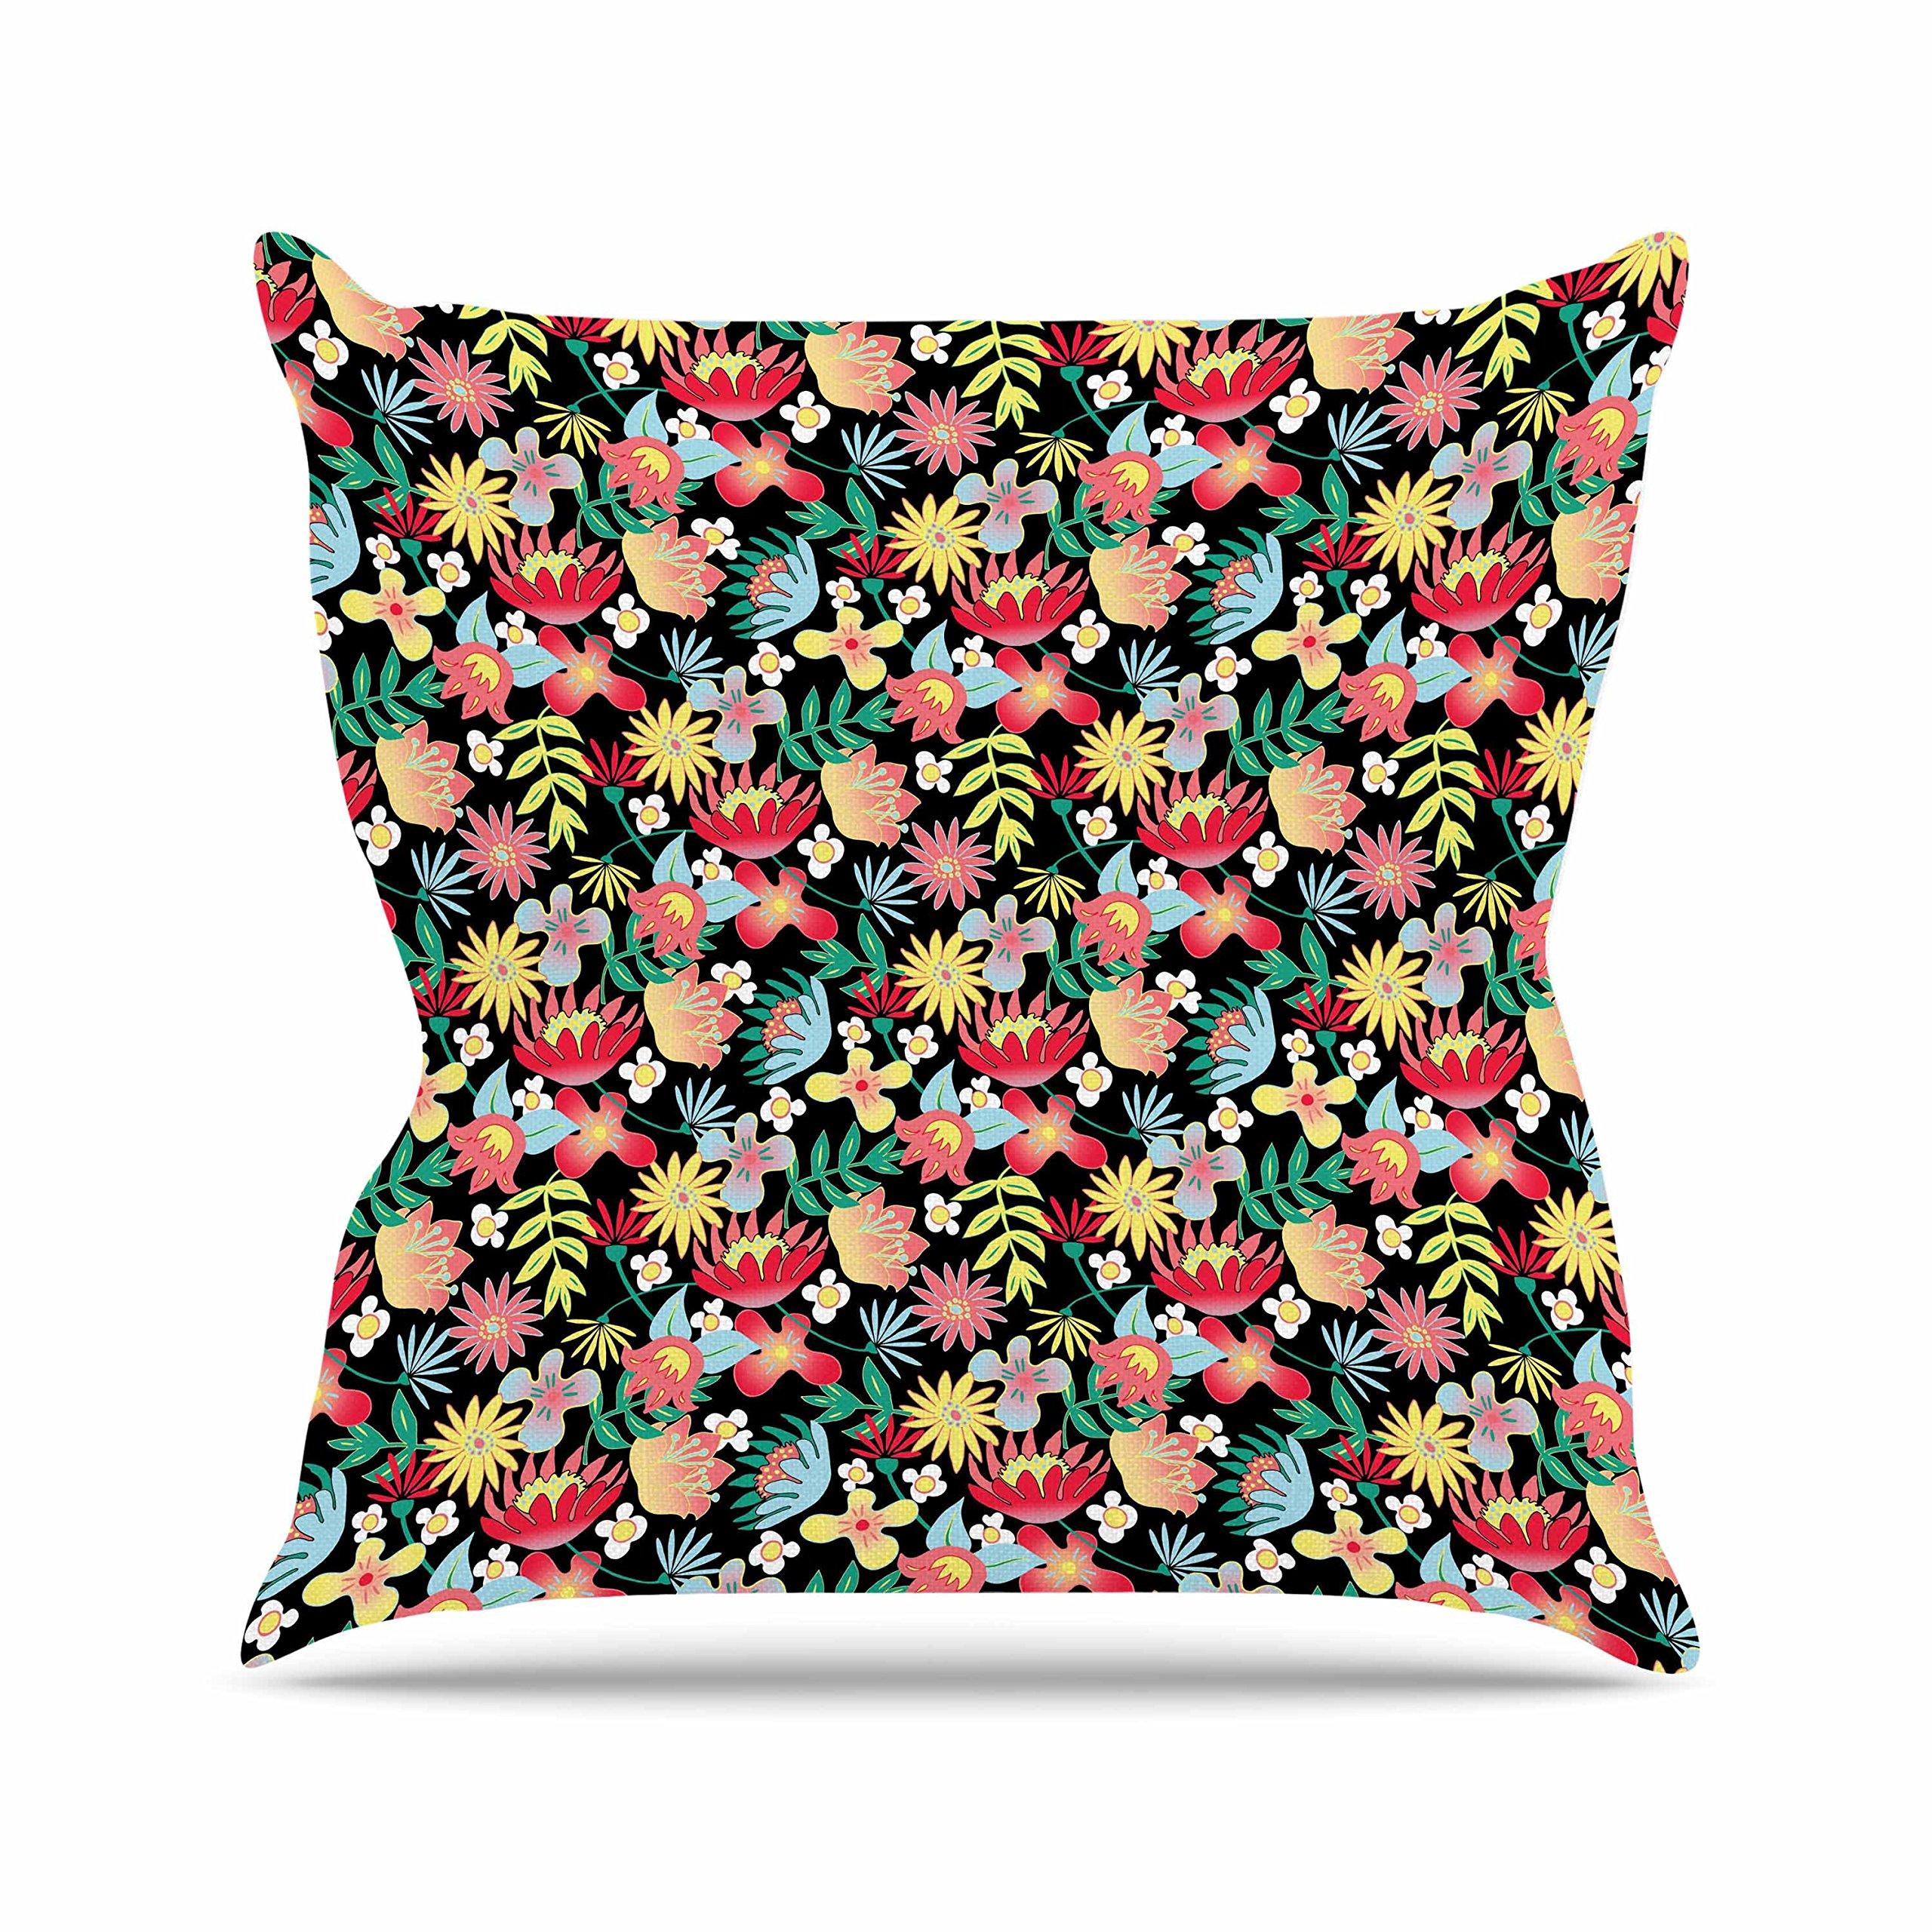 Kess InHouse DLKG Design Flower Power Gold Black Outdoor Throw Pillow, 18'' x 18''